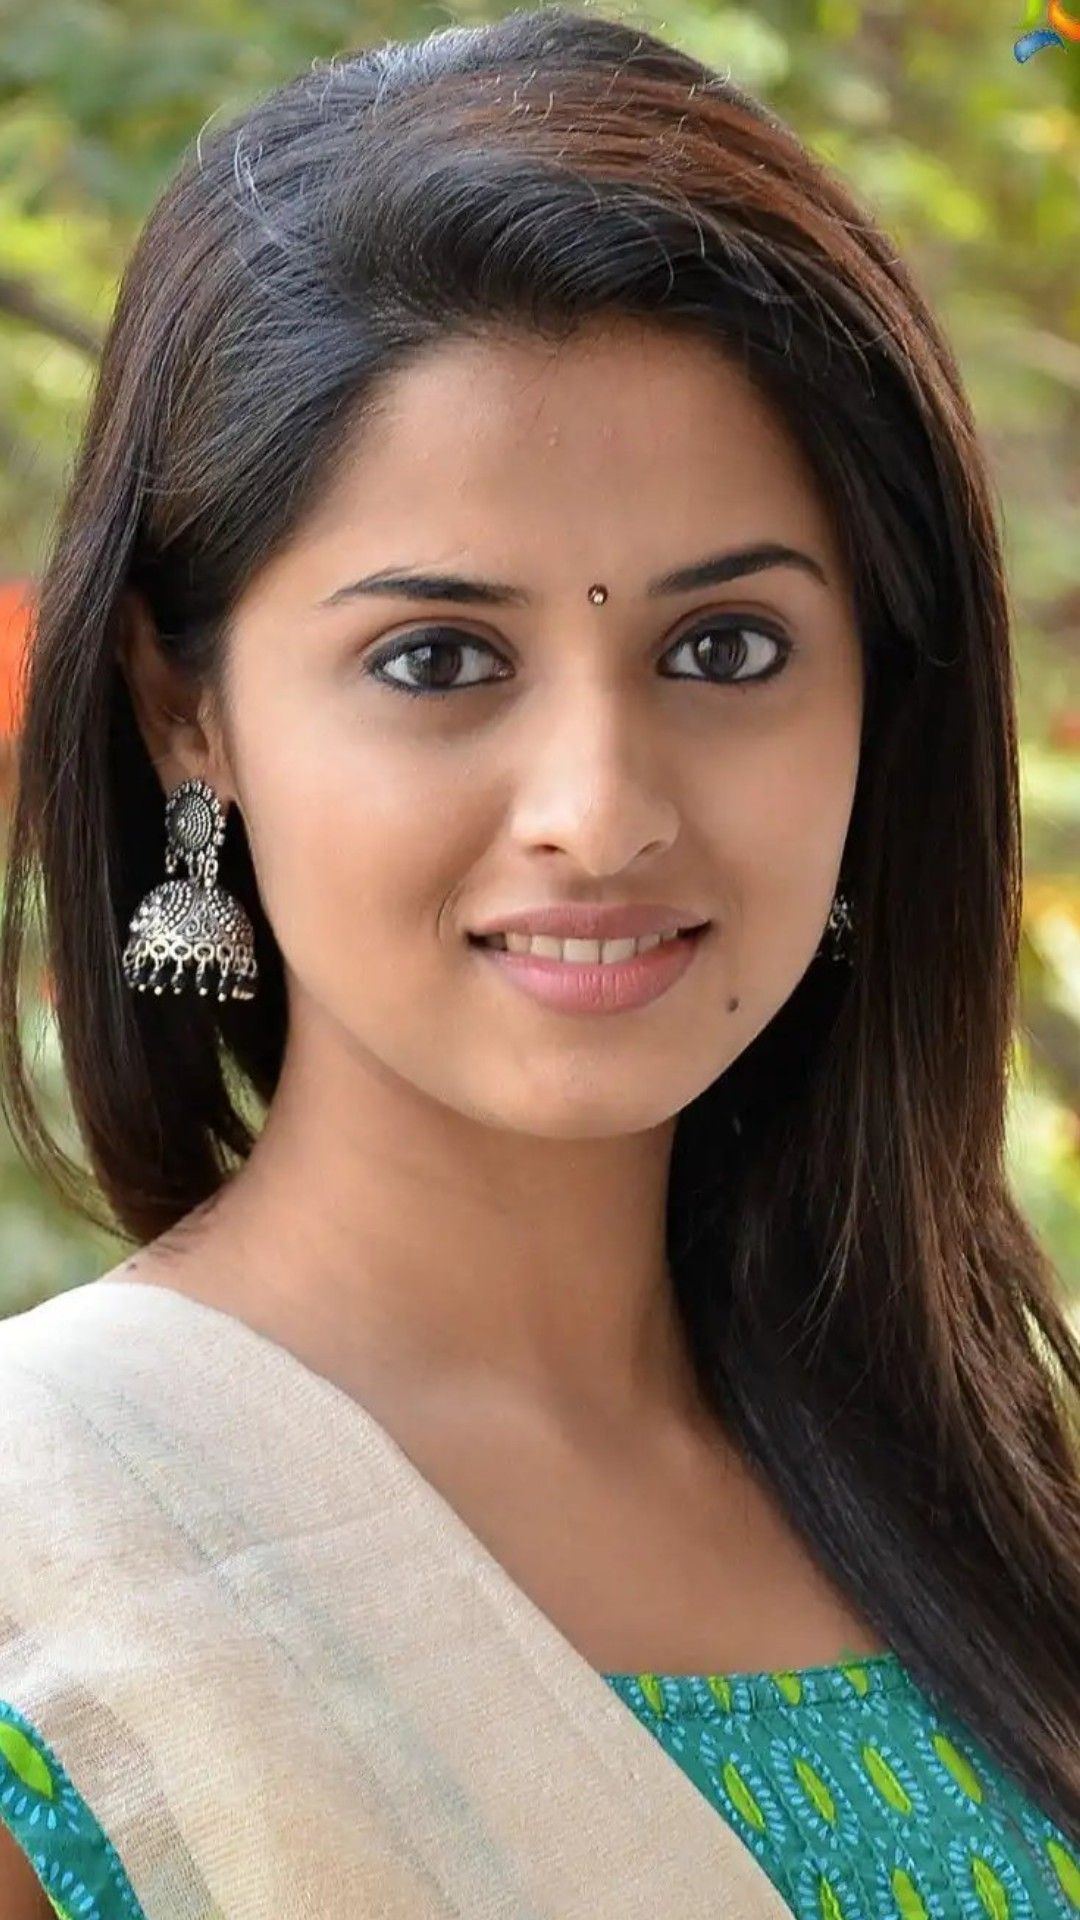 Manoj beautiful girl in 2019 t India beauty Beautiful and